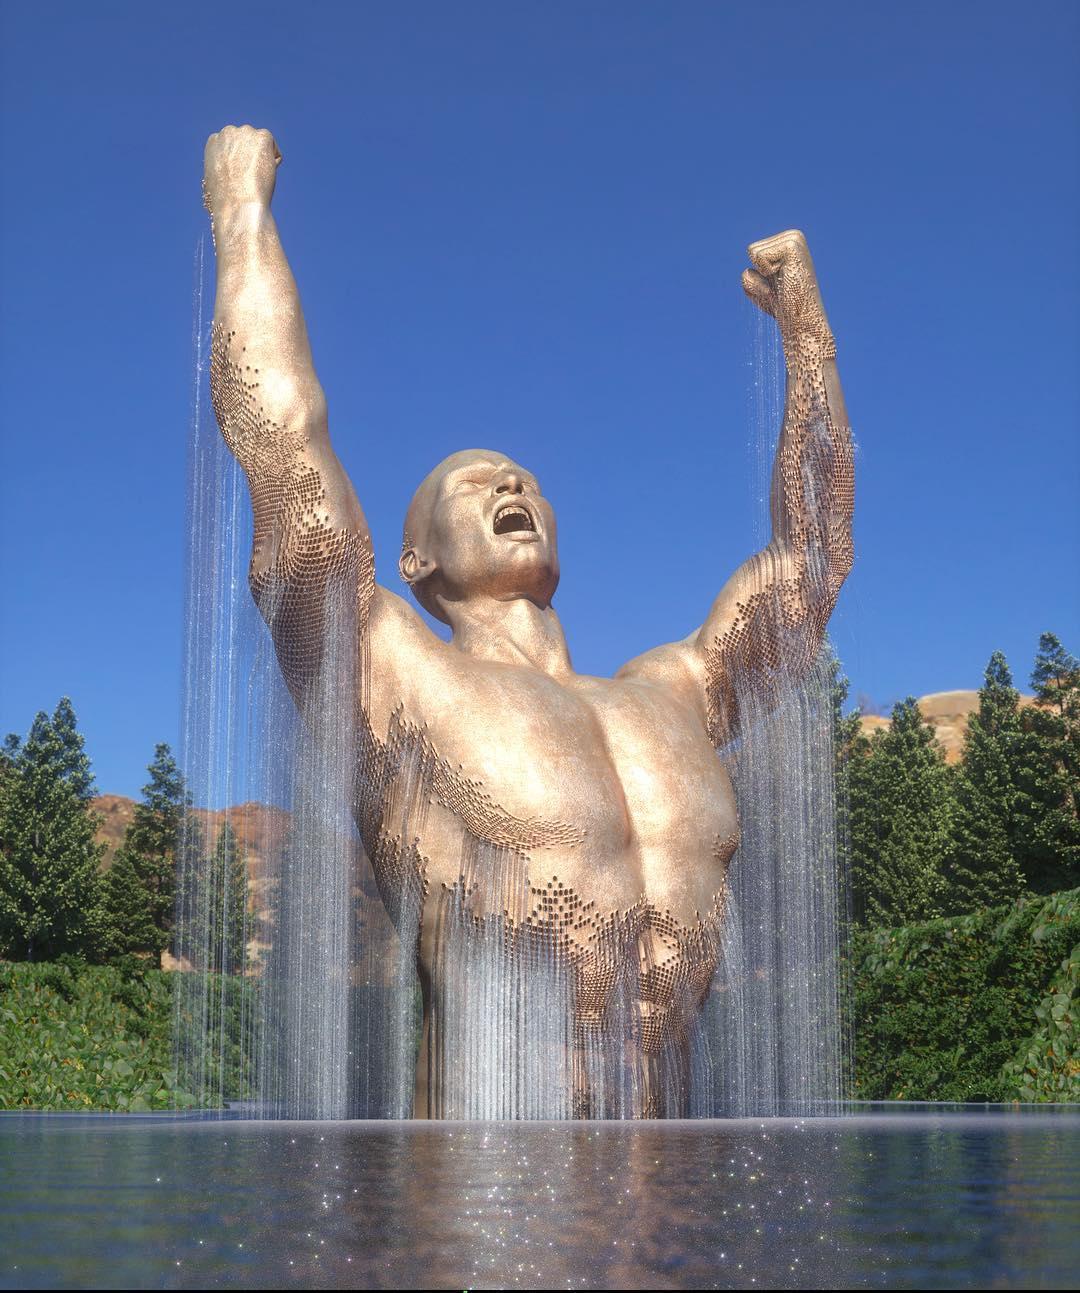 Chad Knight's digital art creates huge digital sculptures | Collater.al